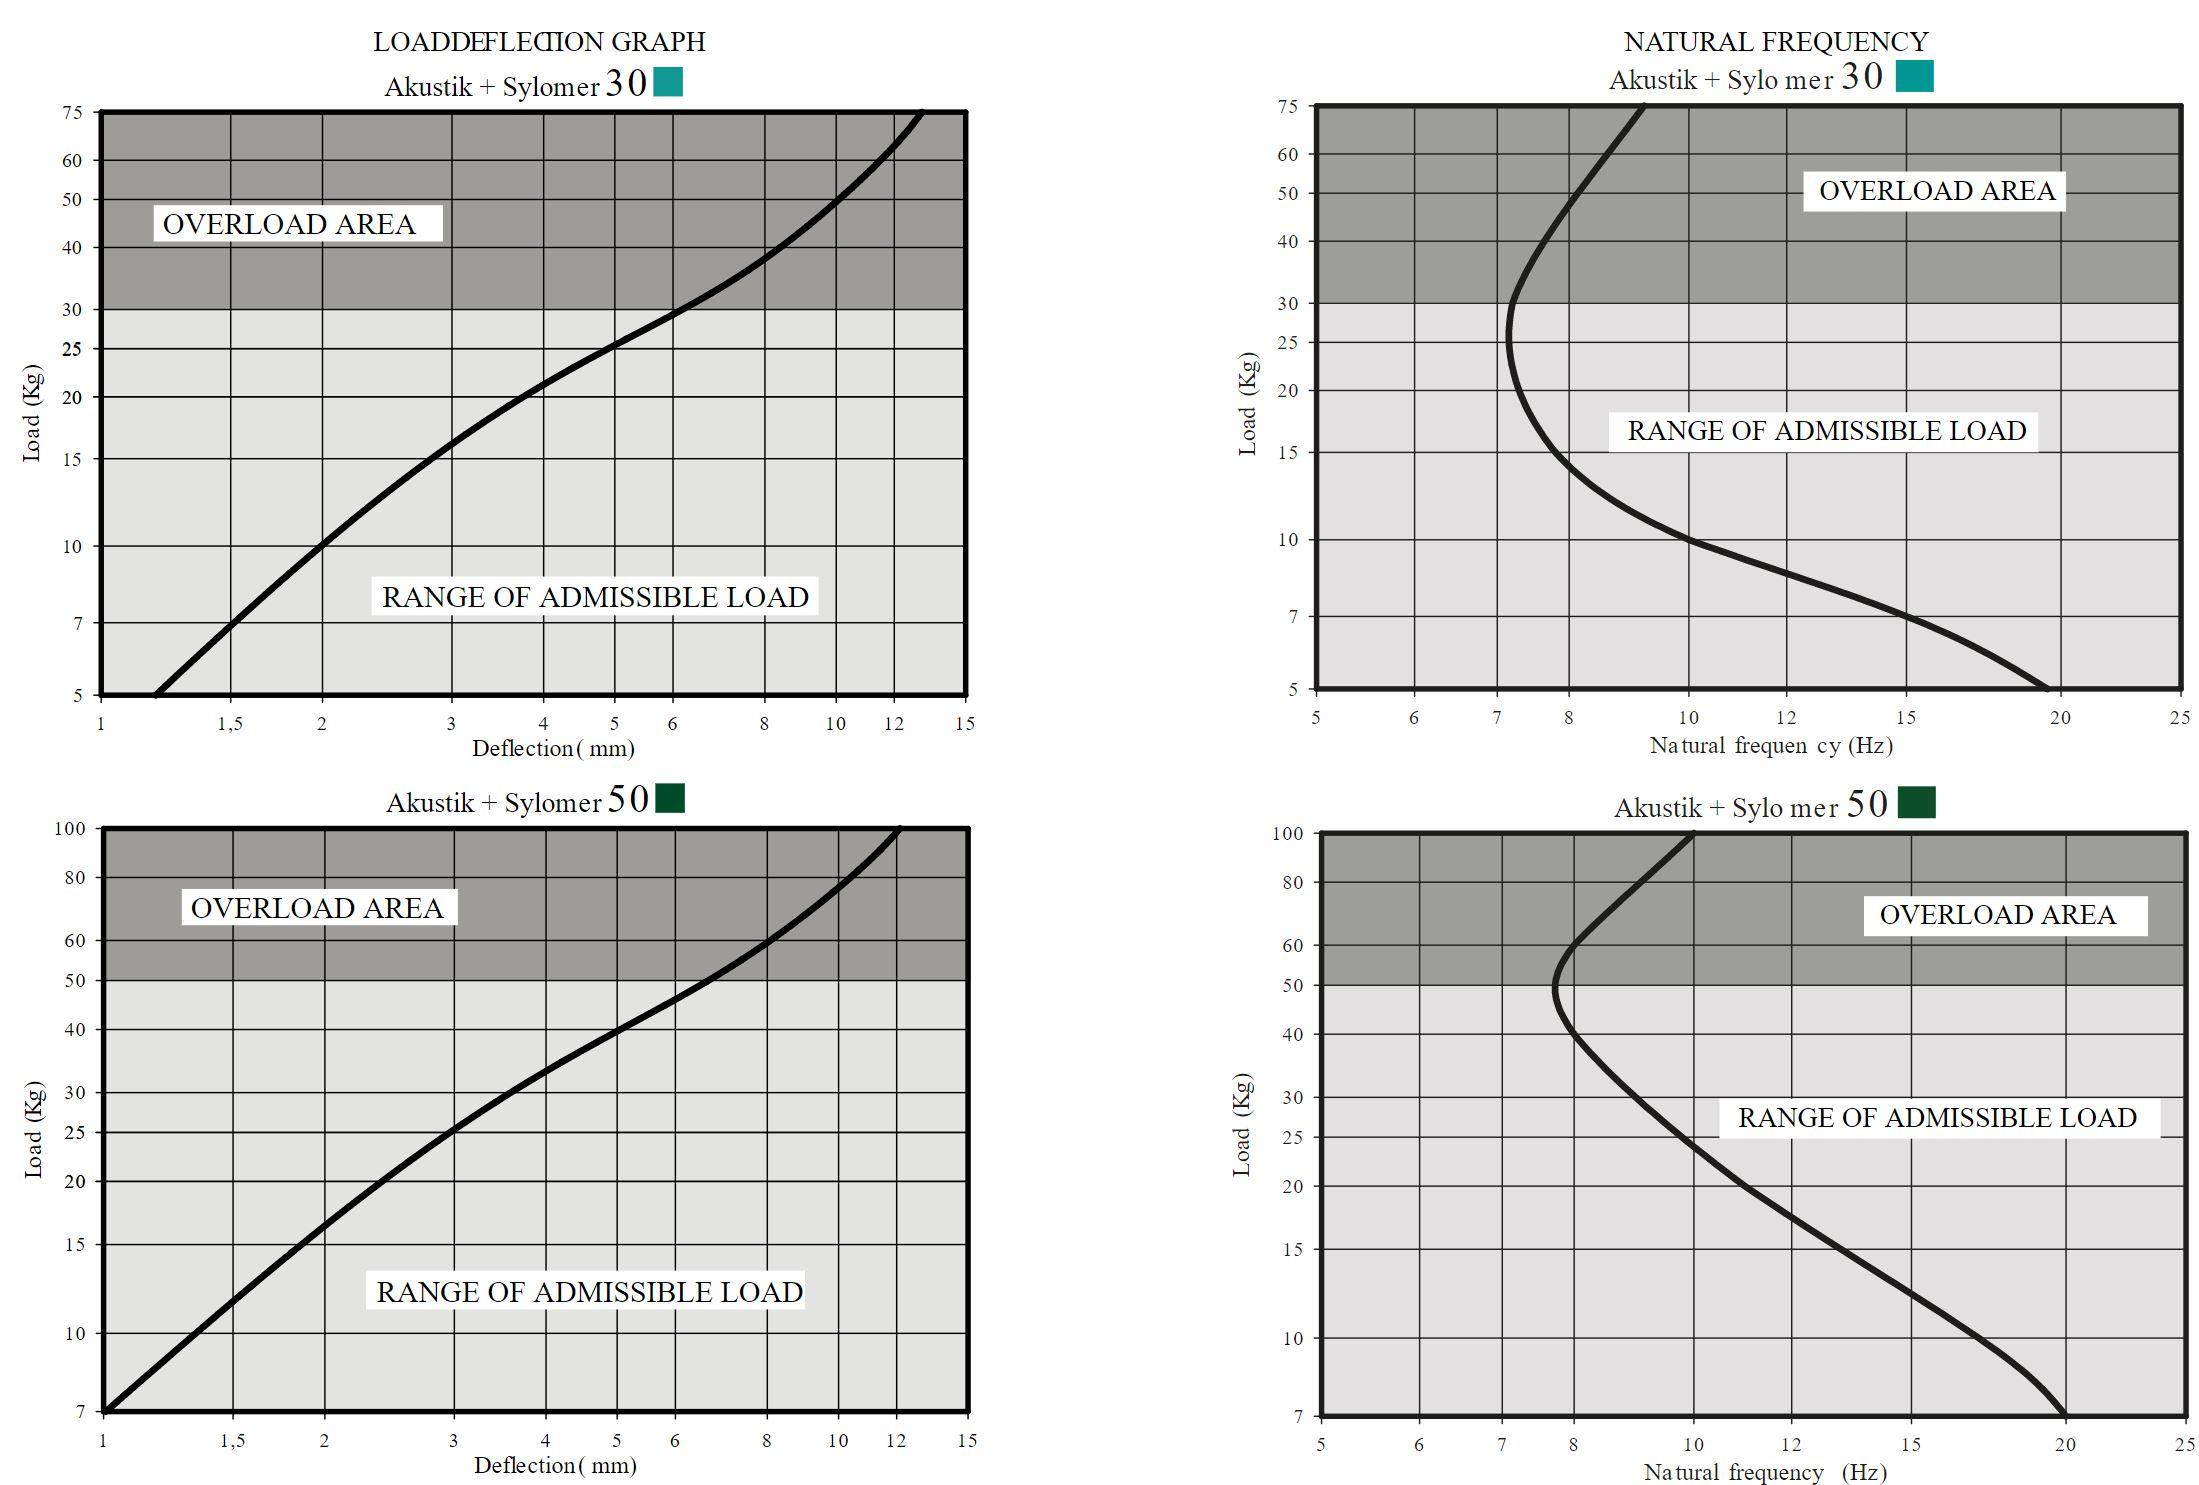 Akustik Rapid + Sylomer Curve 1